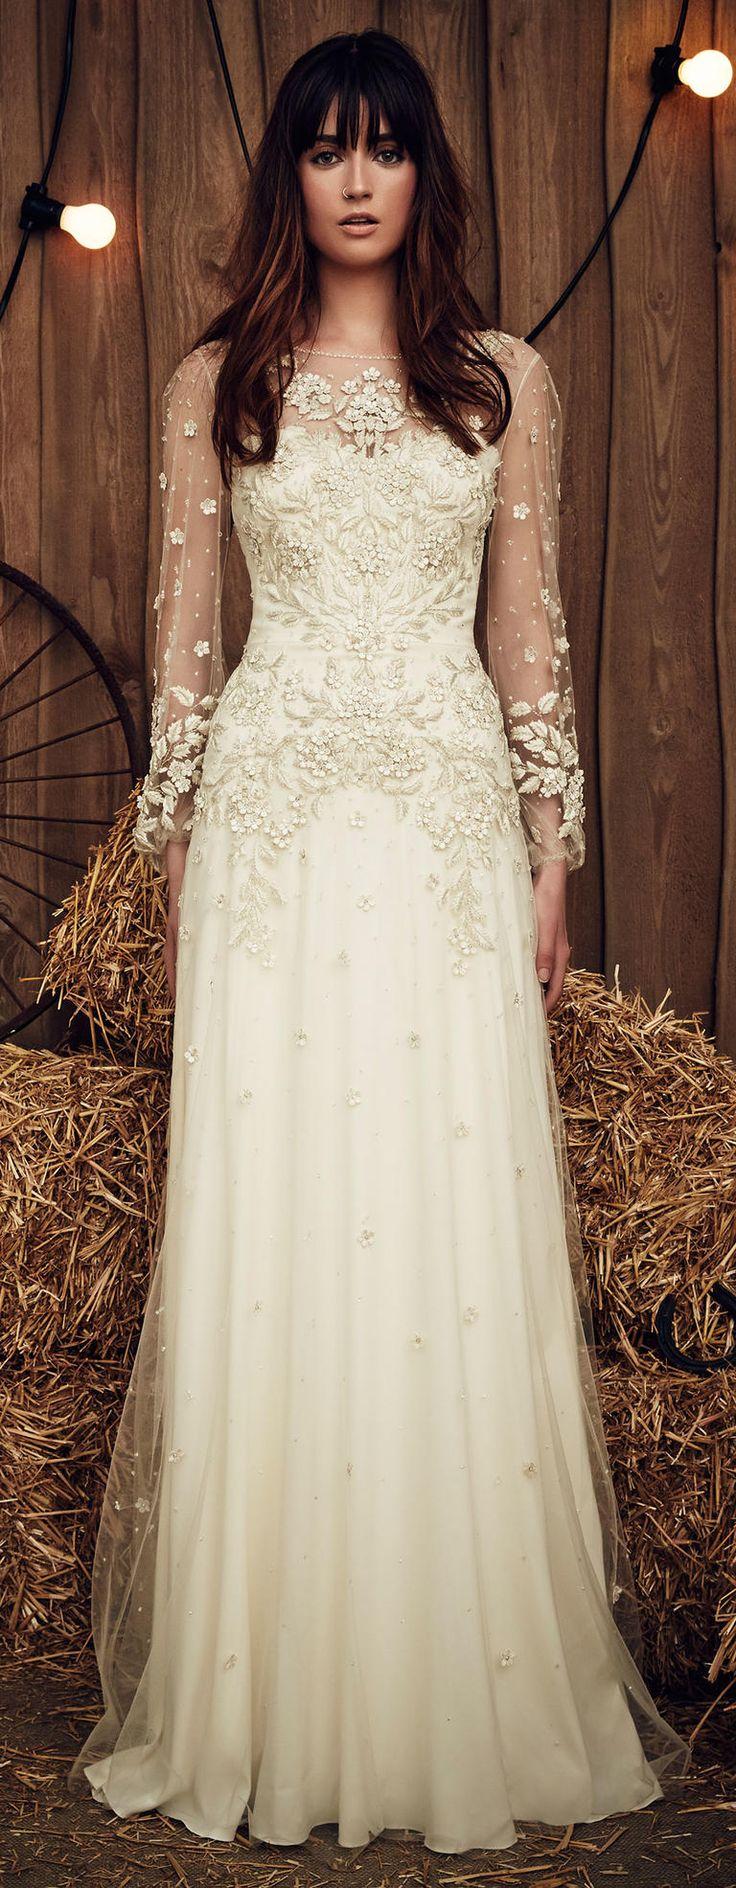 jenny packham wedding dresses ivory wedding dresses Celadon Green Hits the Runway at Jenny Packham s Gypsy Inspired Spring Show Jenny Packham BridalJenny Packham Wedding DressesIvory